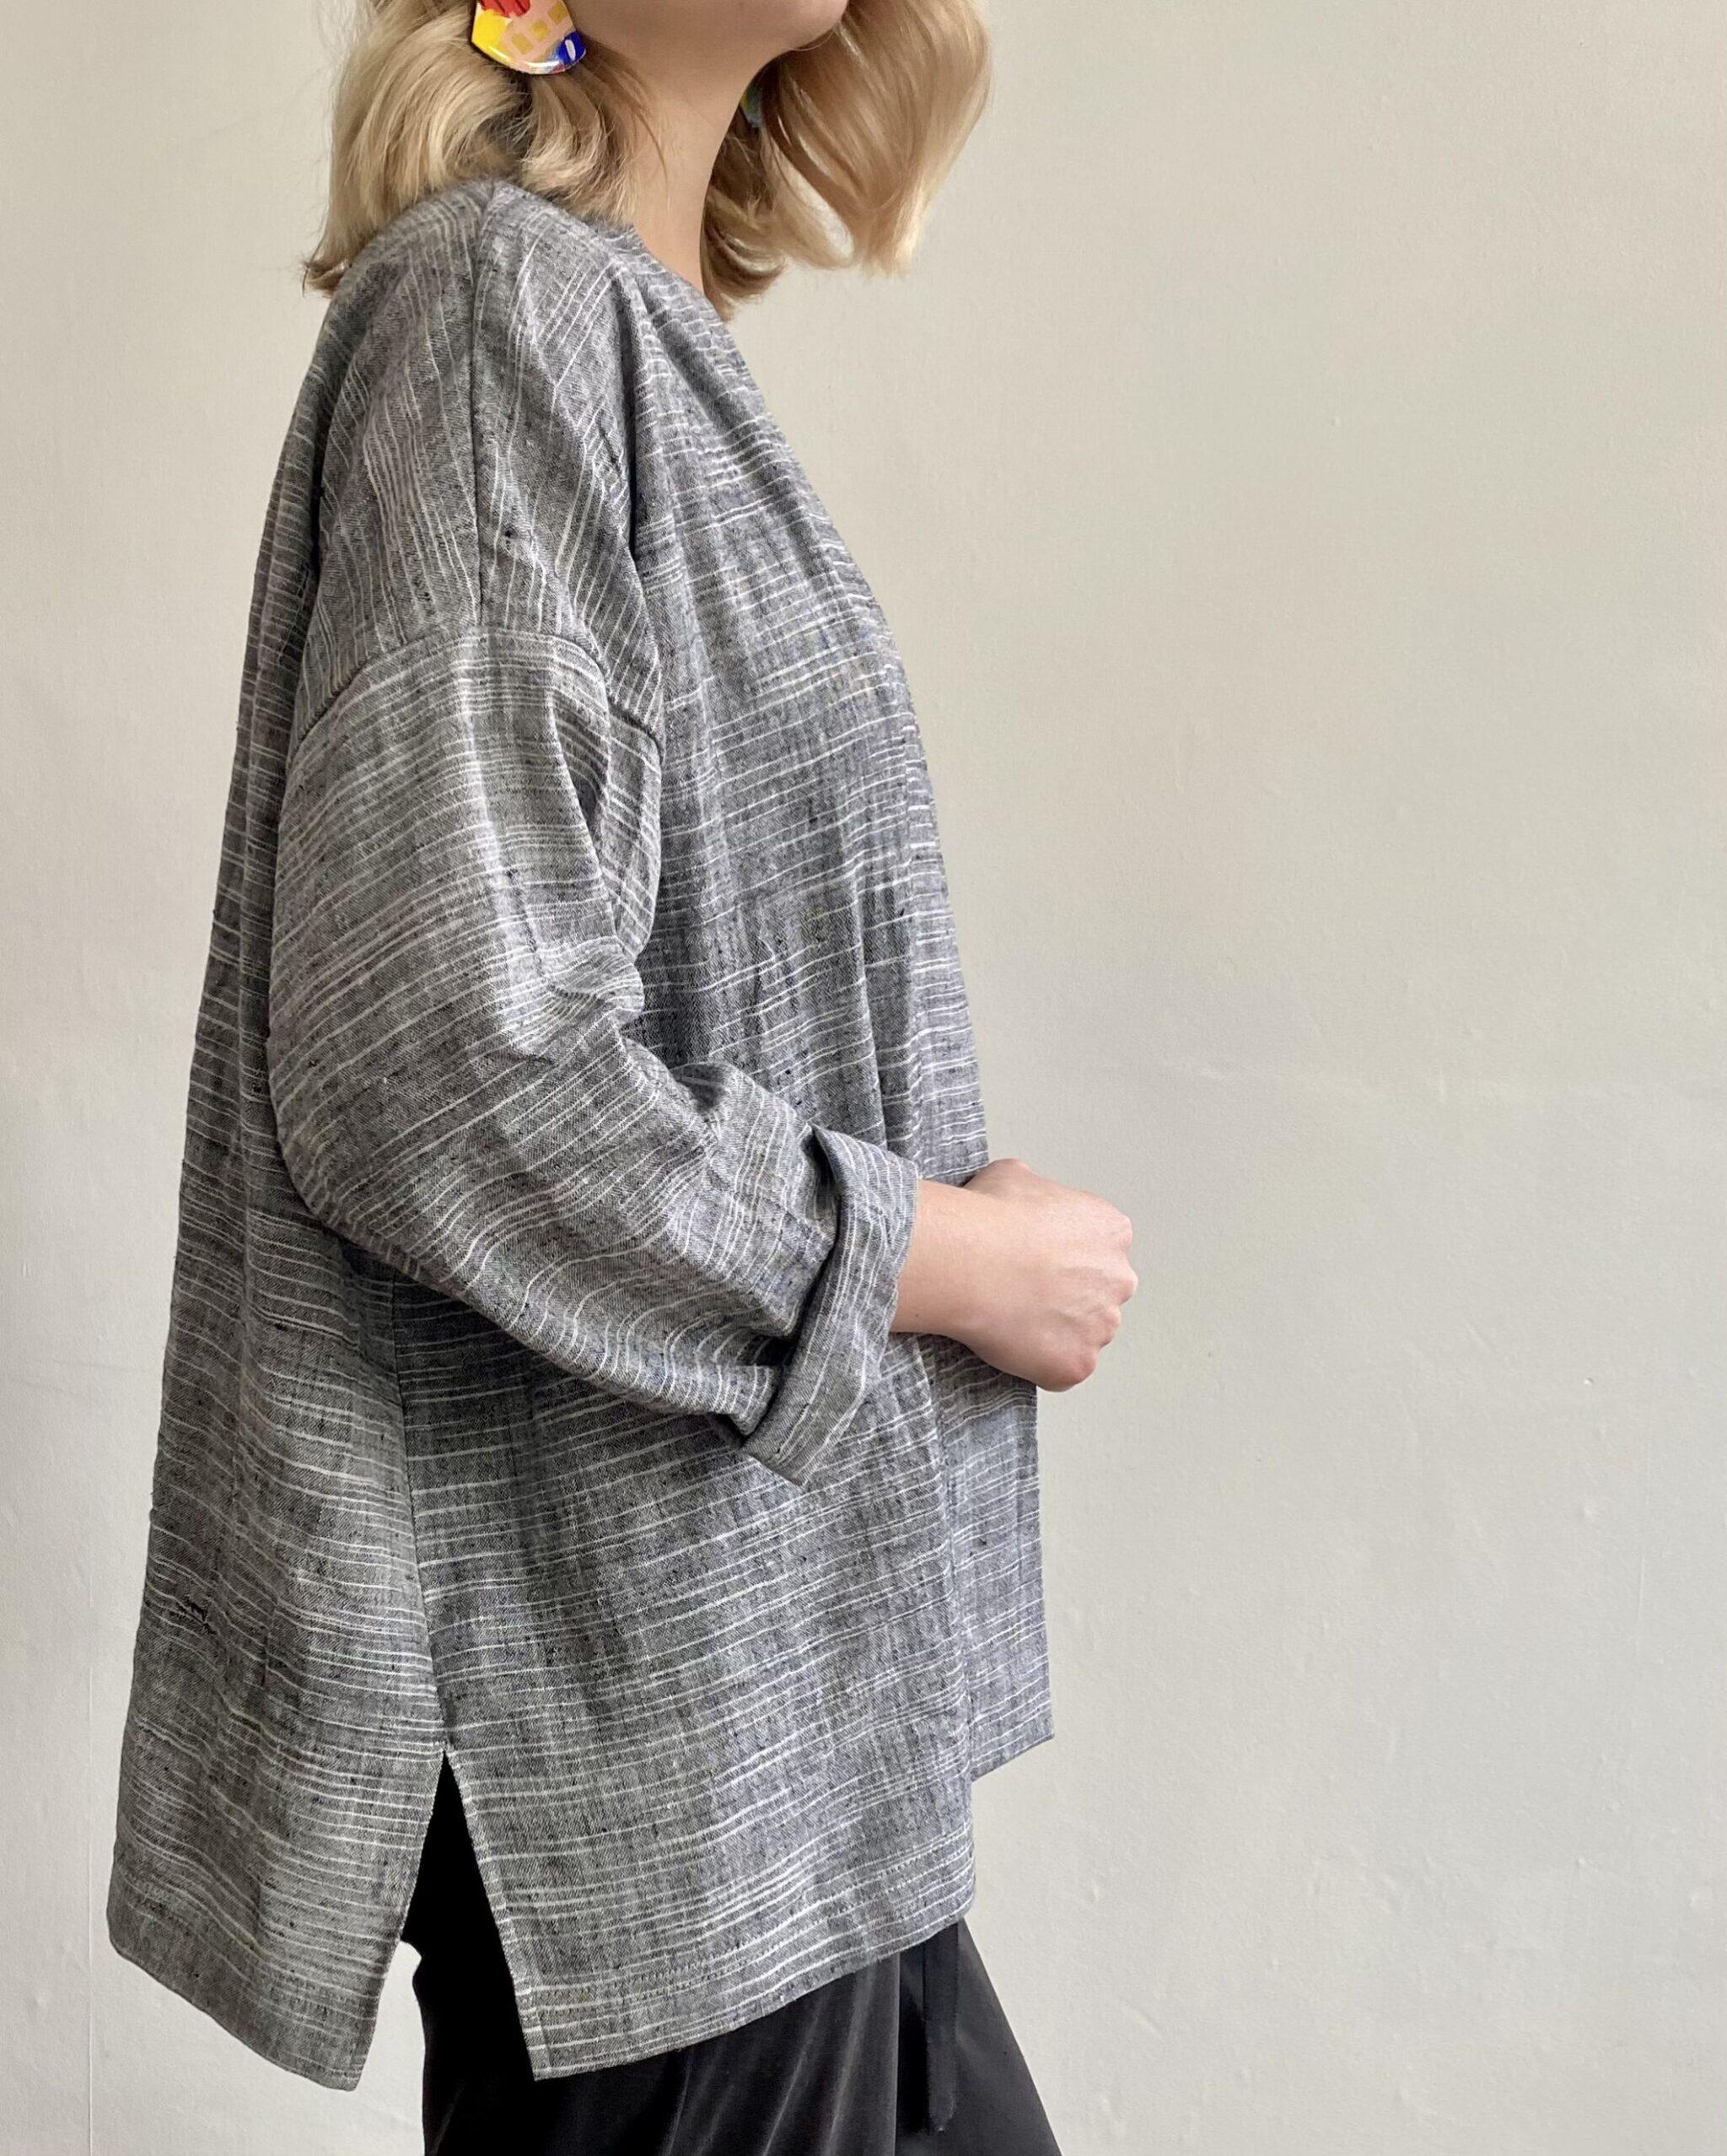 handwoven fair trade duster jacket